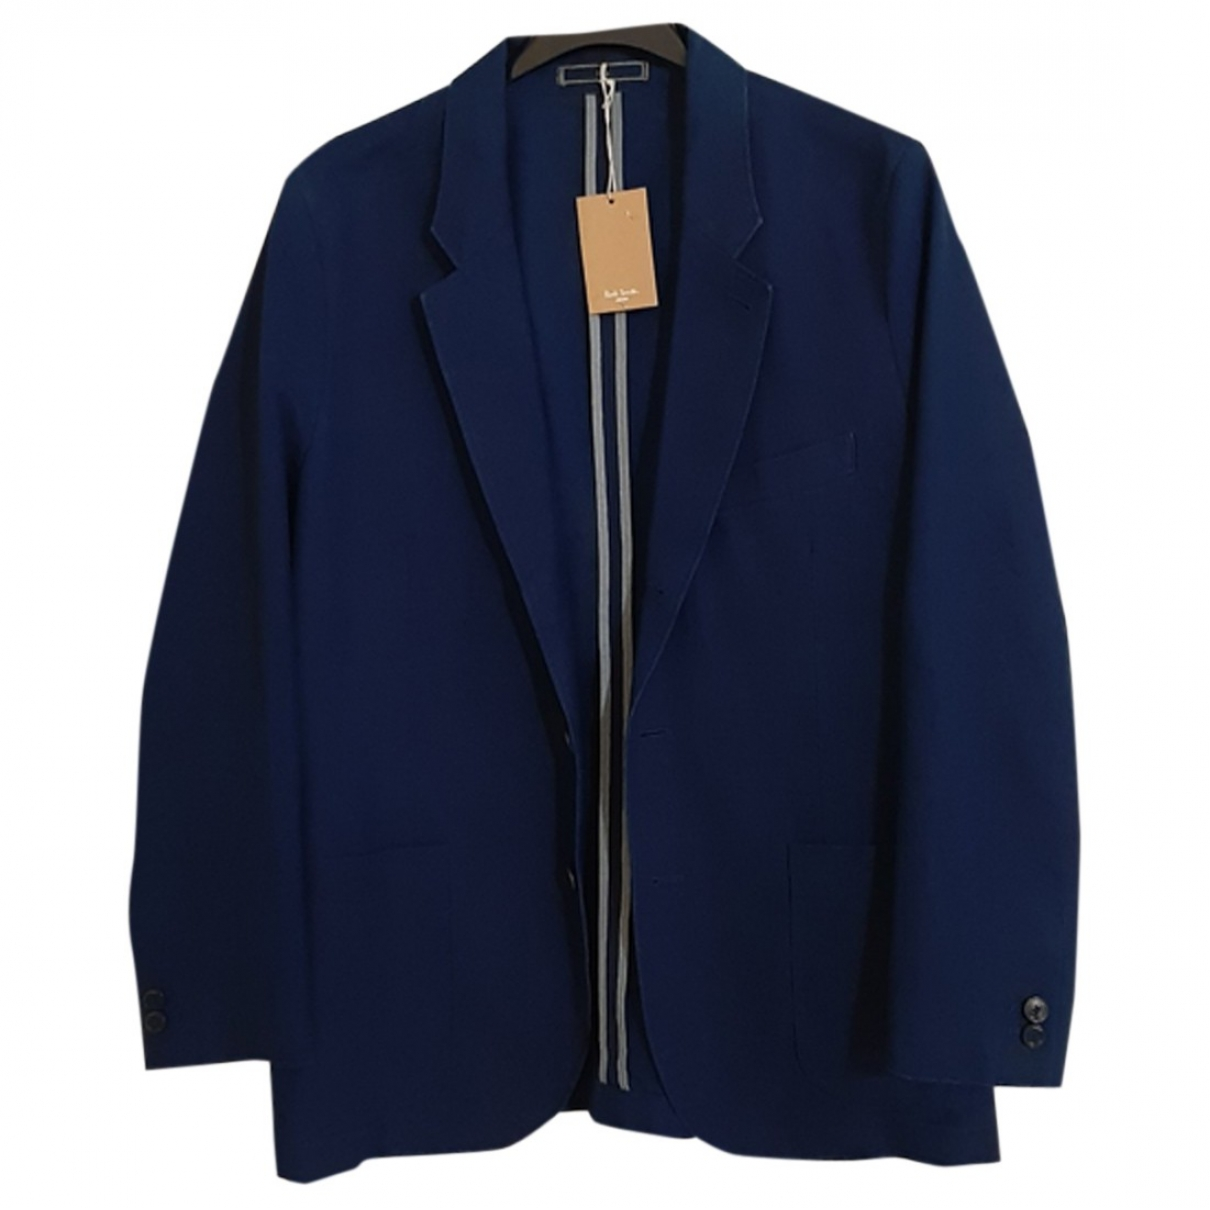 Paul Smith \N Blue Cotton jacket  for Men L International